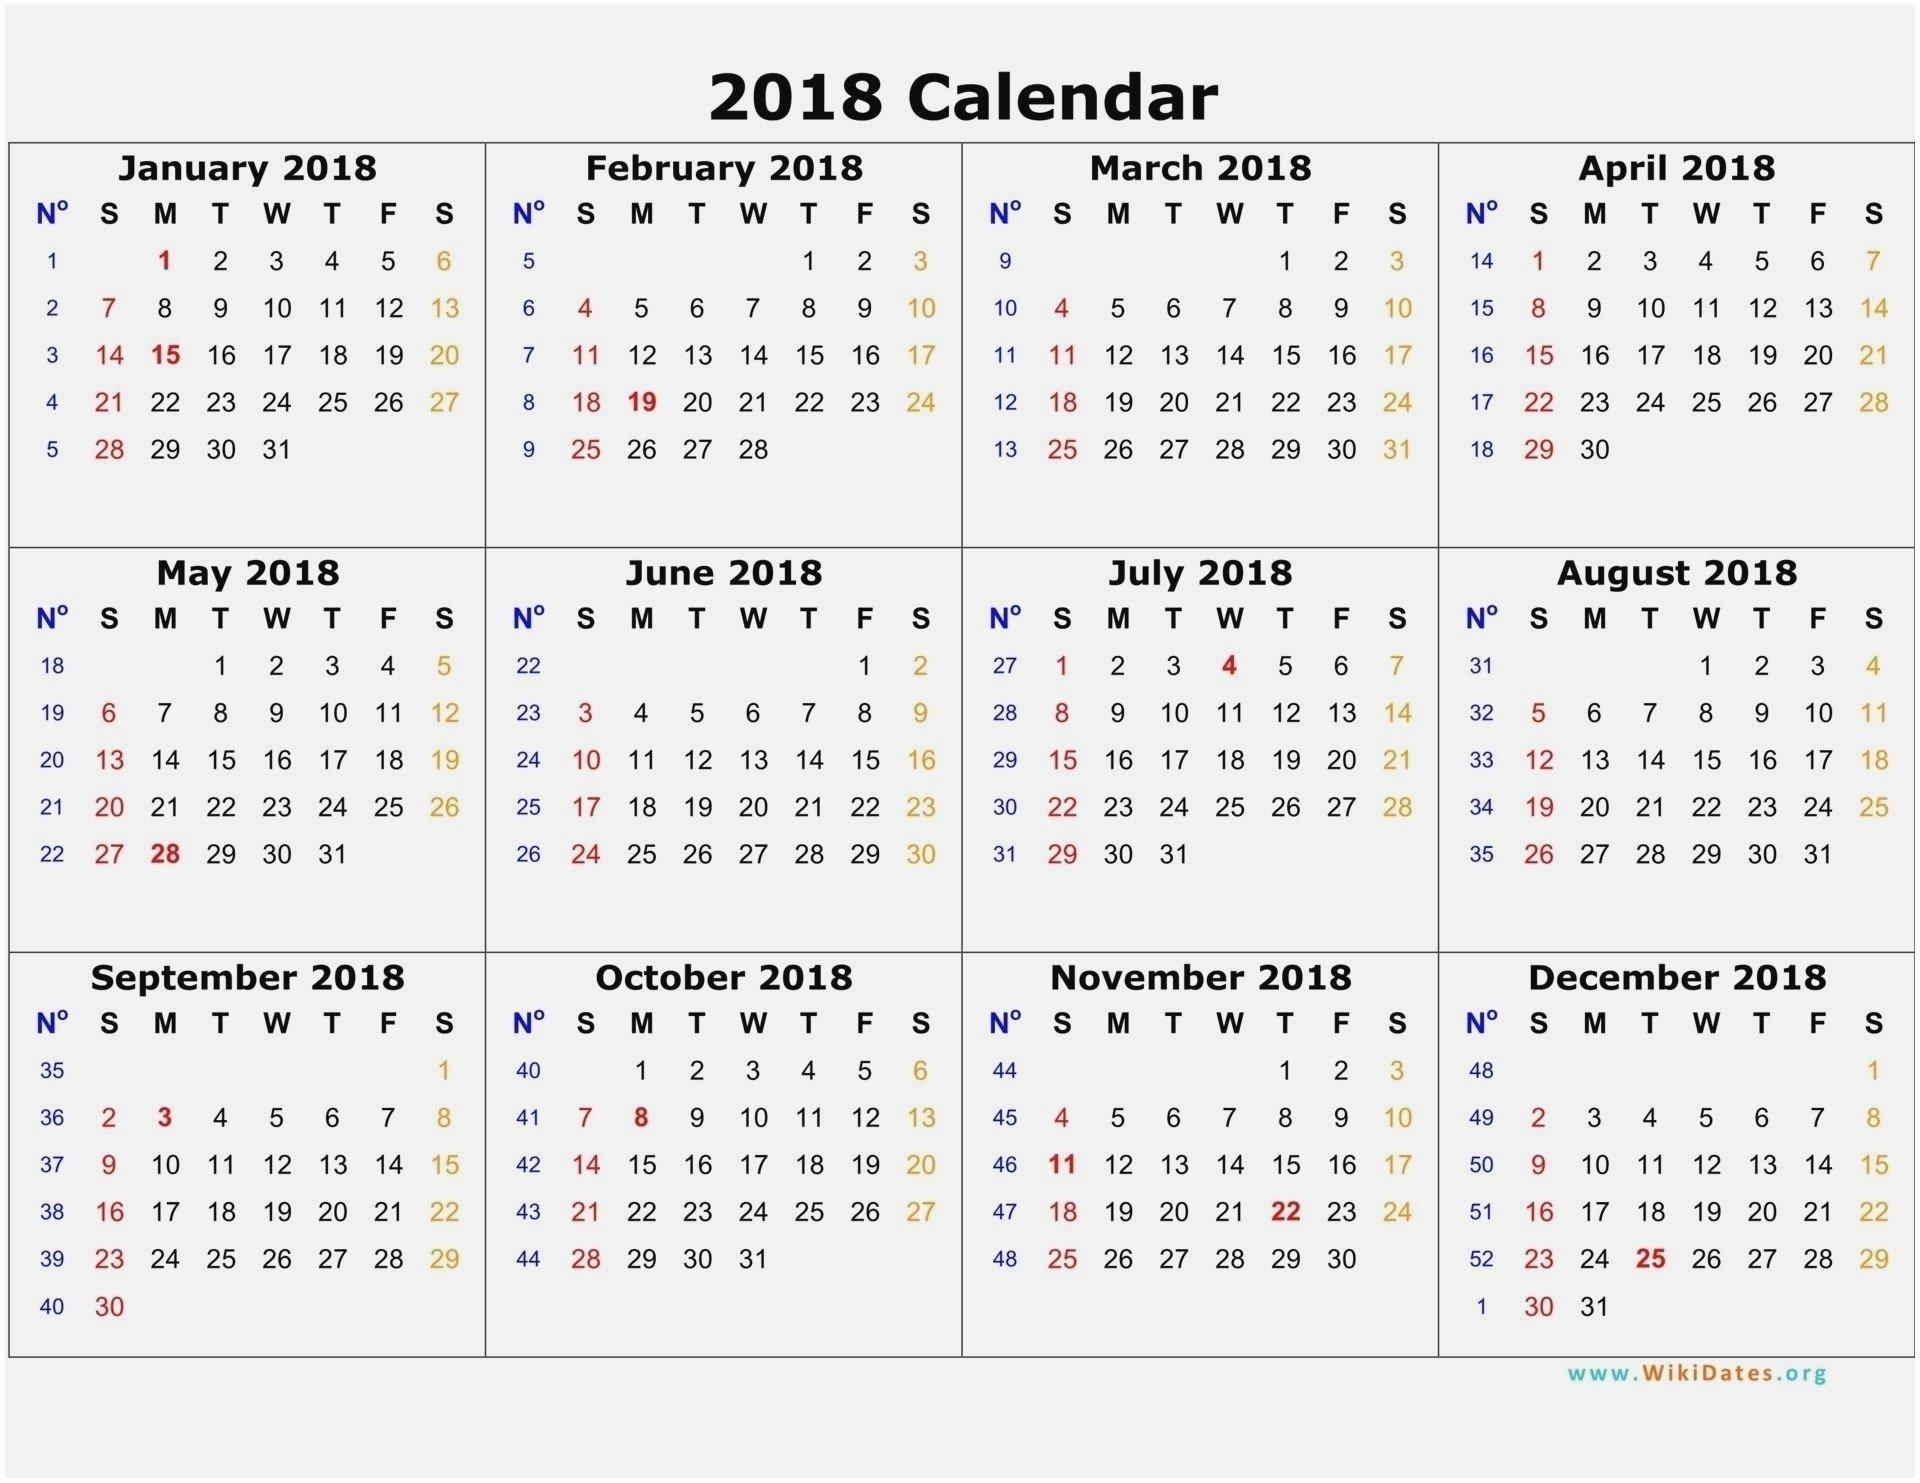 Free Printable Perpetual Julian Calendar – Calendar Depo Provera Leap Year Calendar